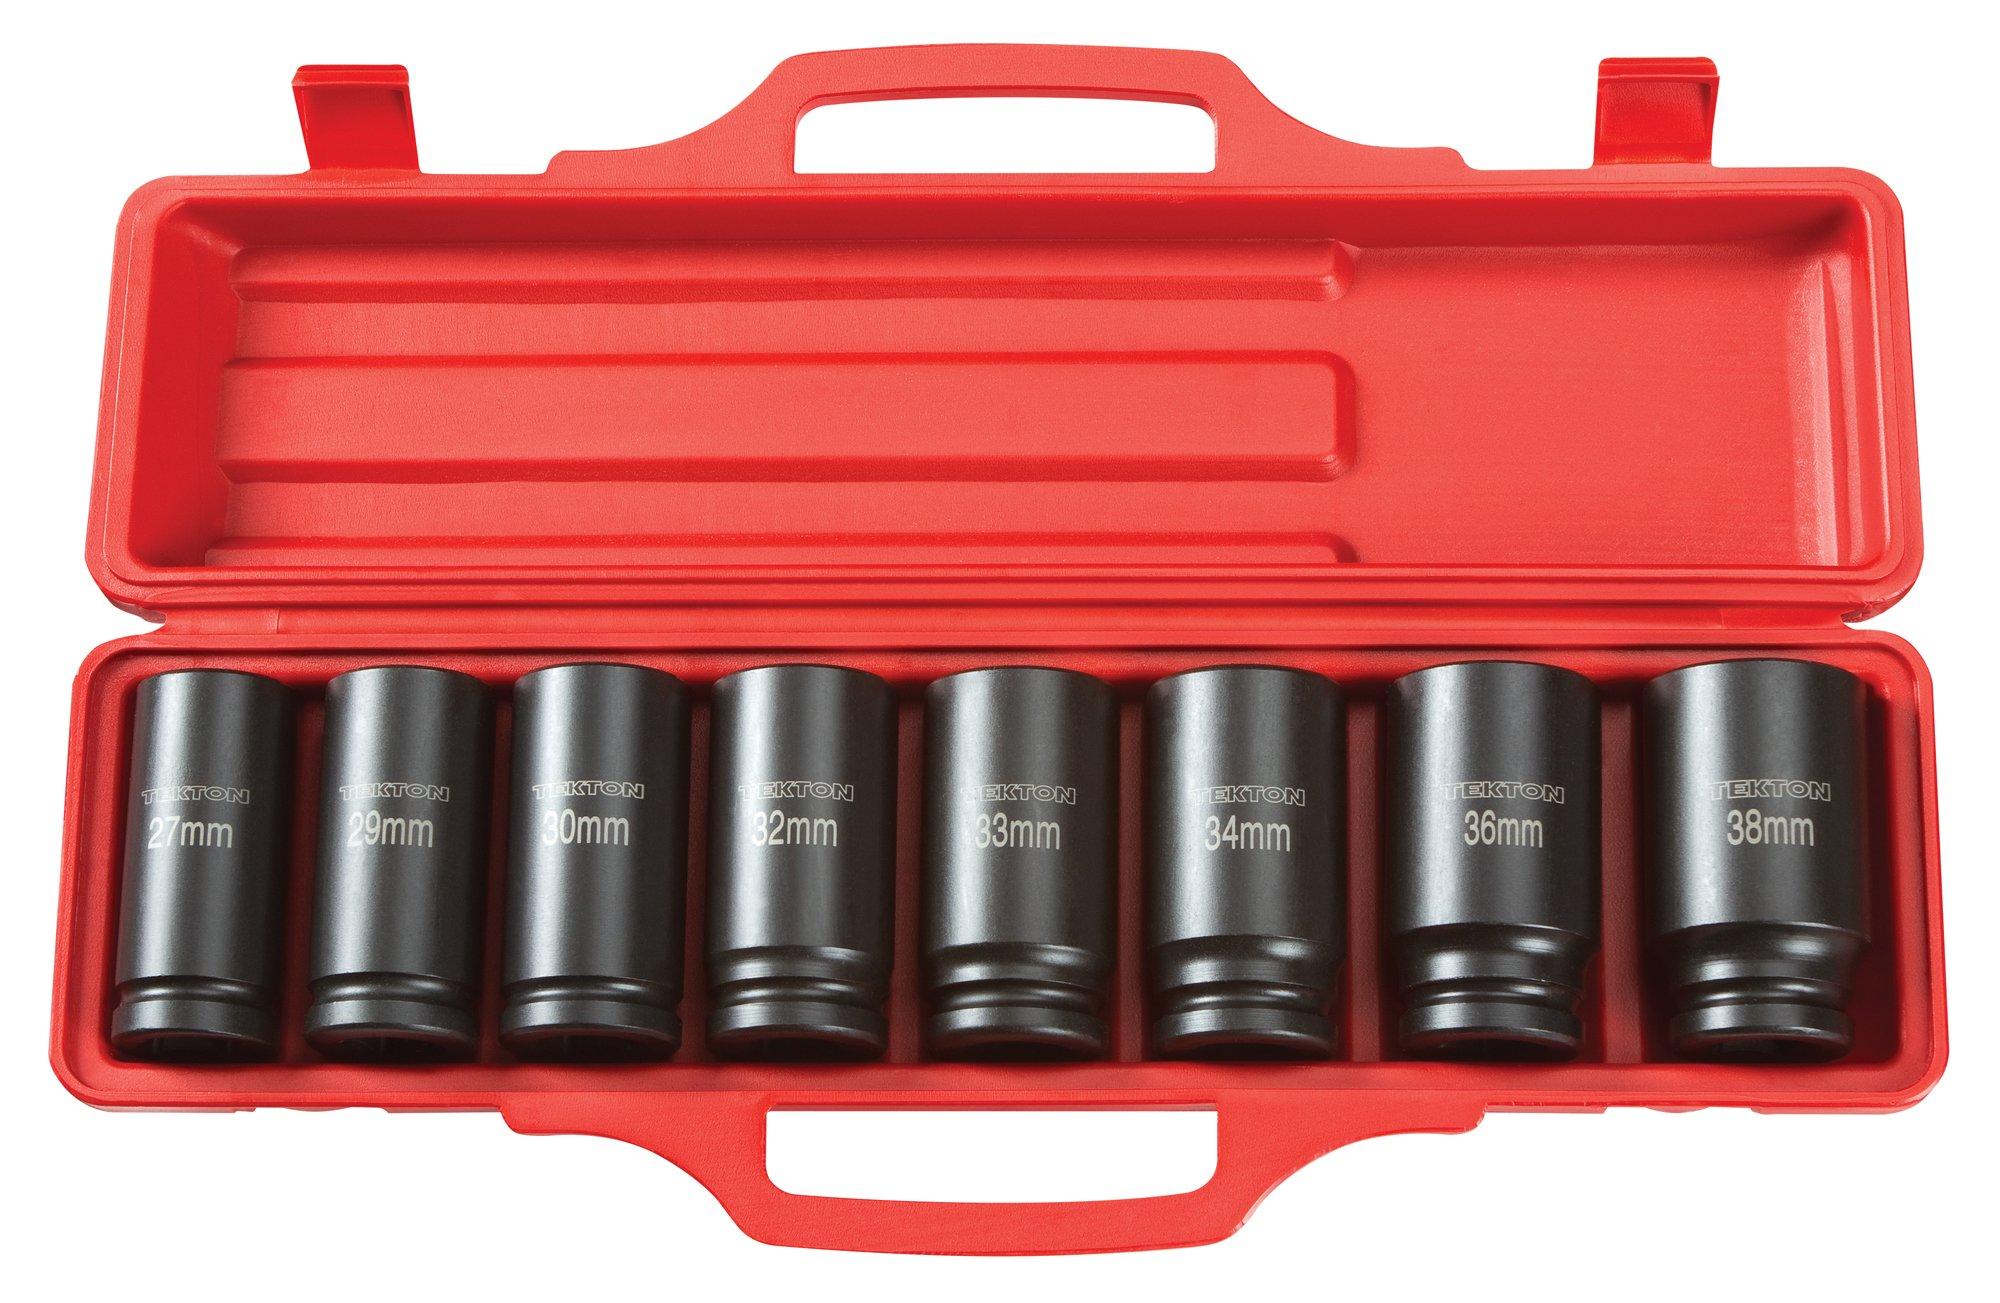 13-Sockets Metric Cr-V 7 mm 6-Point TEKTON 3//8-Inch Drive Deep Impact Socket Set 47925 19 mm